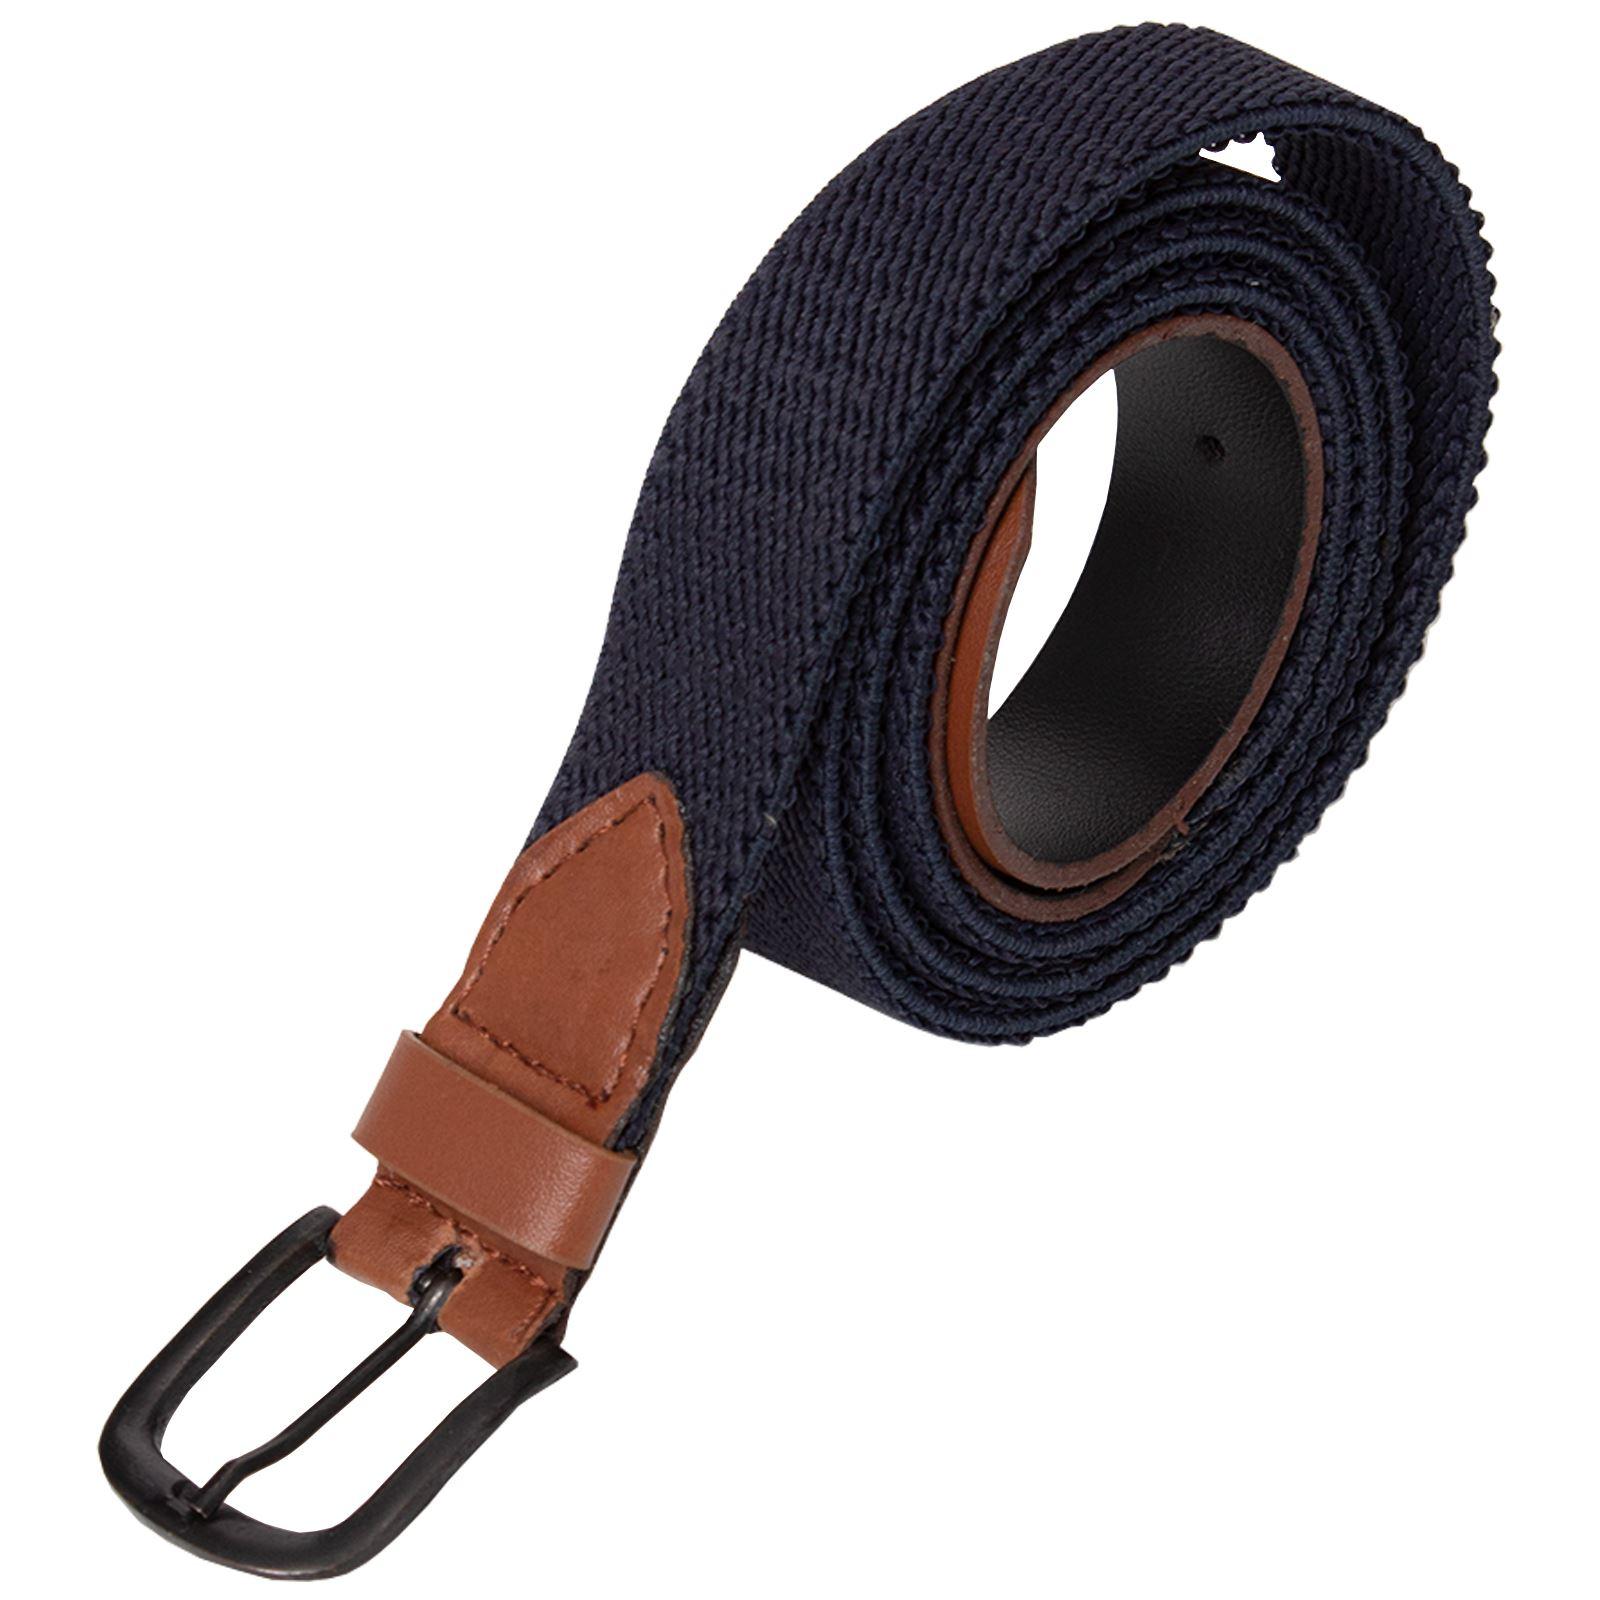 ENZO-Mens-Womens-Elasticated-Belts-Canvas-Stretch-PU-Leather-Trim-Braided-Belt Indexbild 5